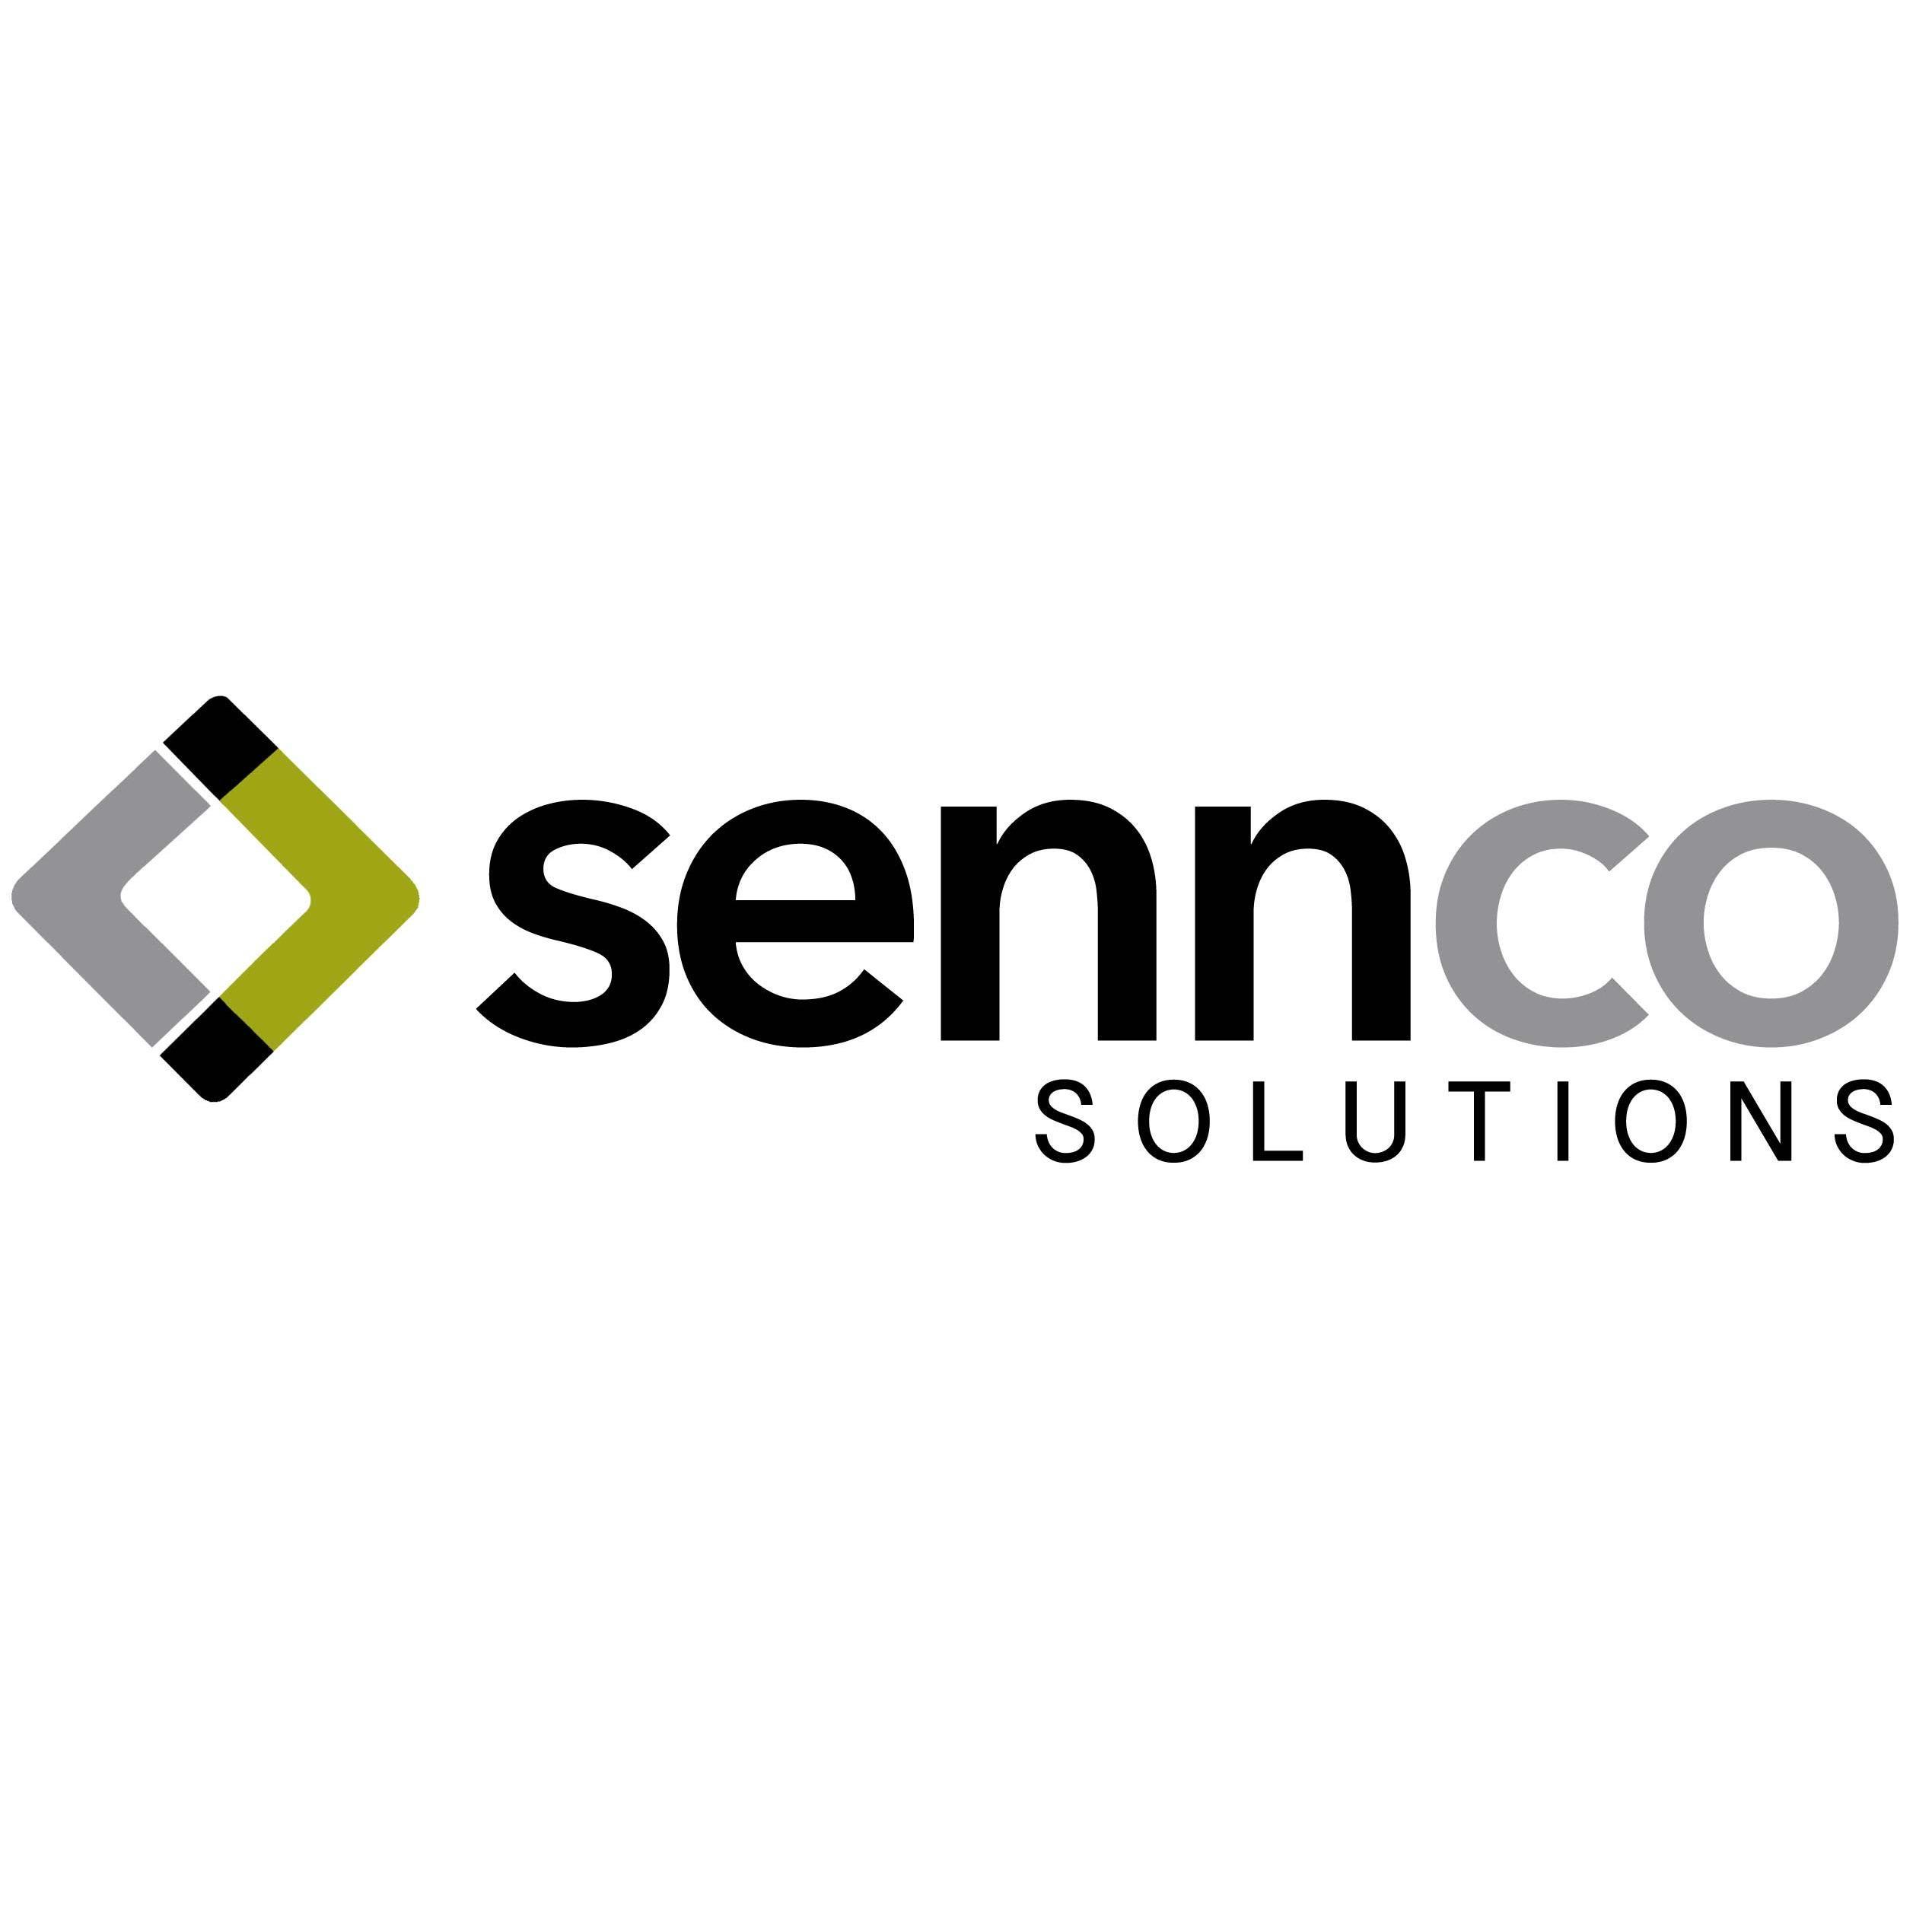 Sennco Solutions, Inc. image 10